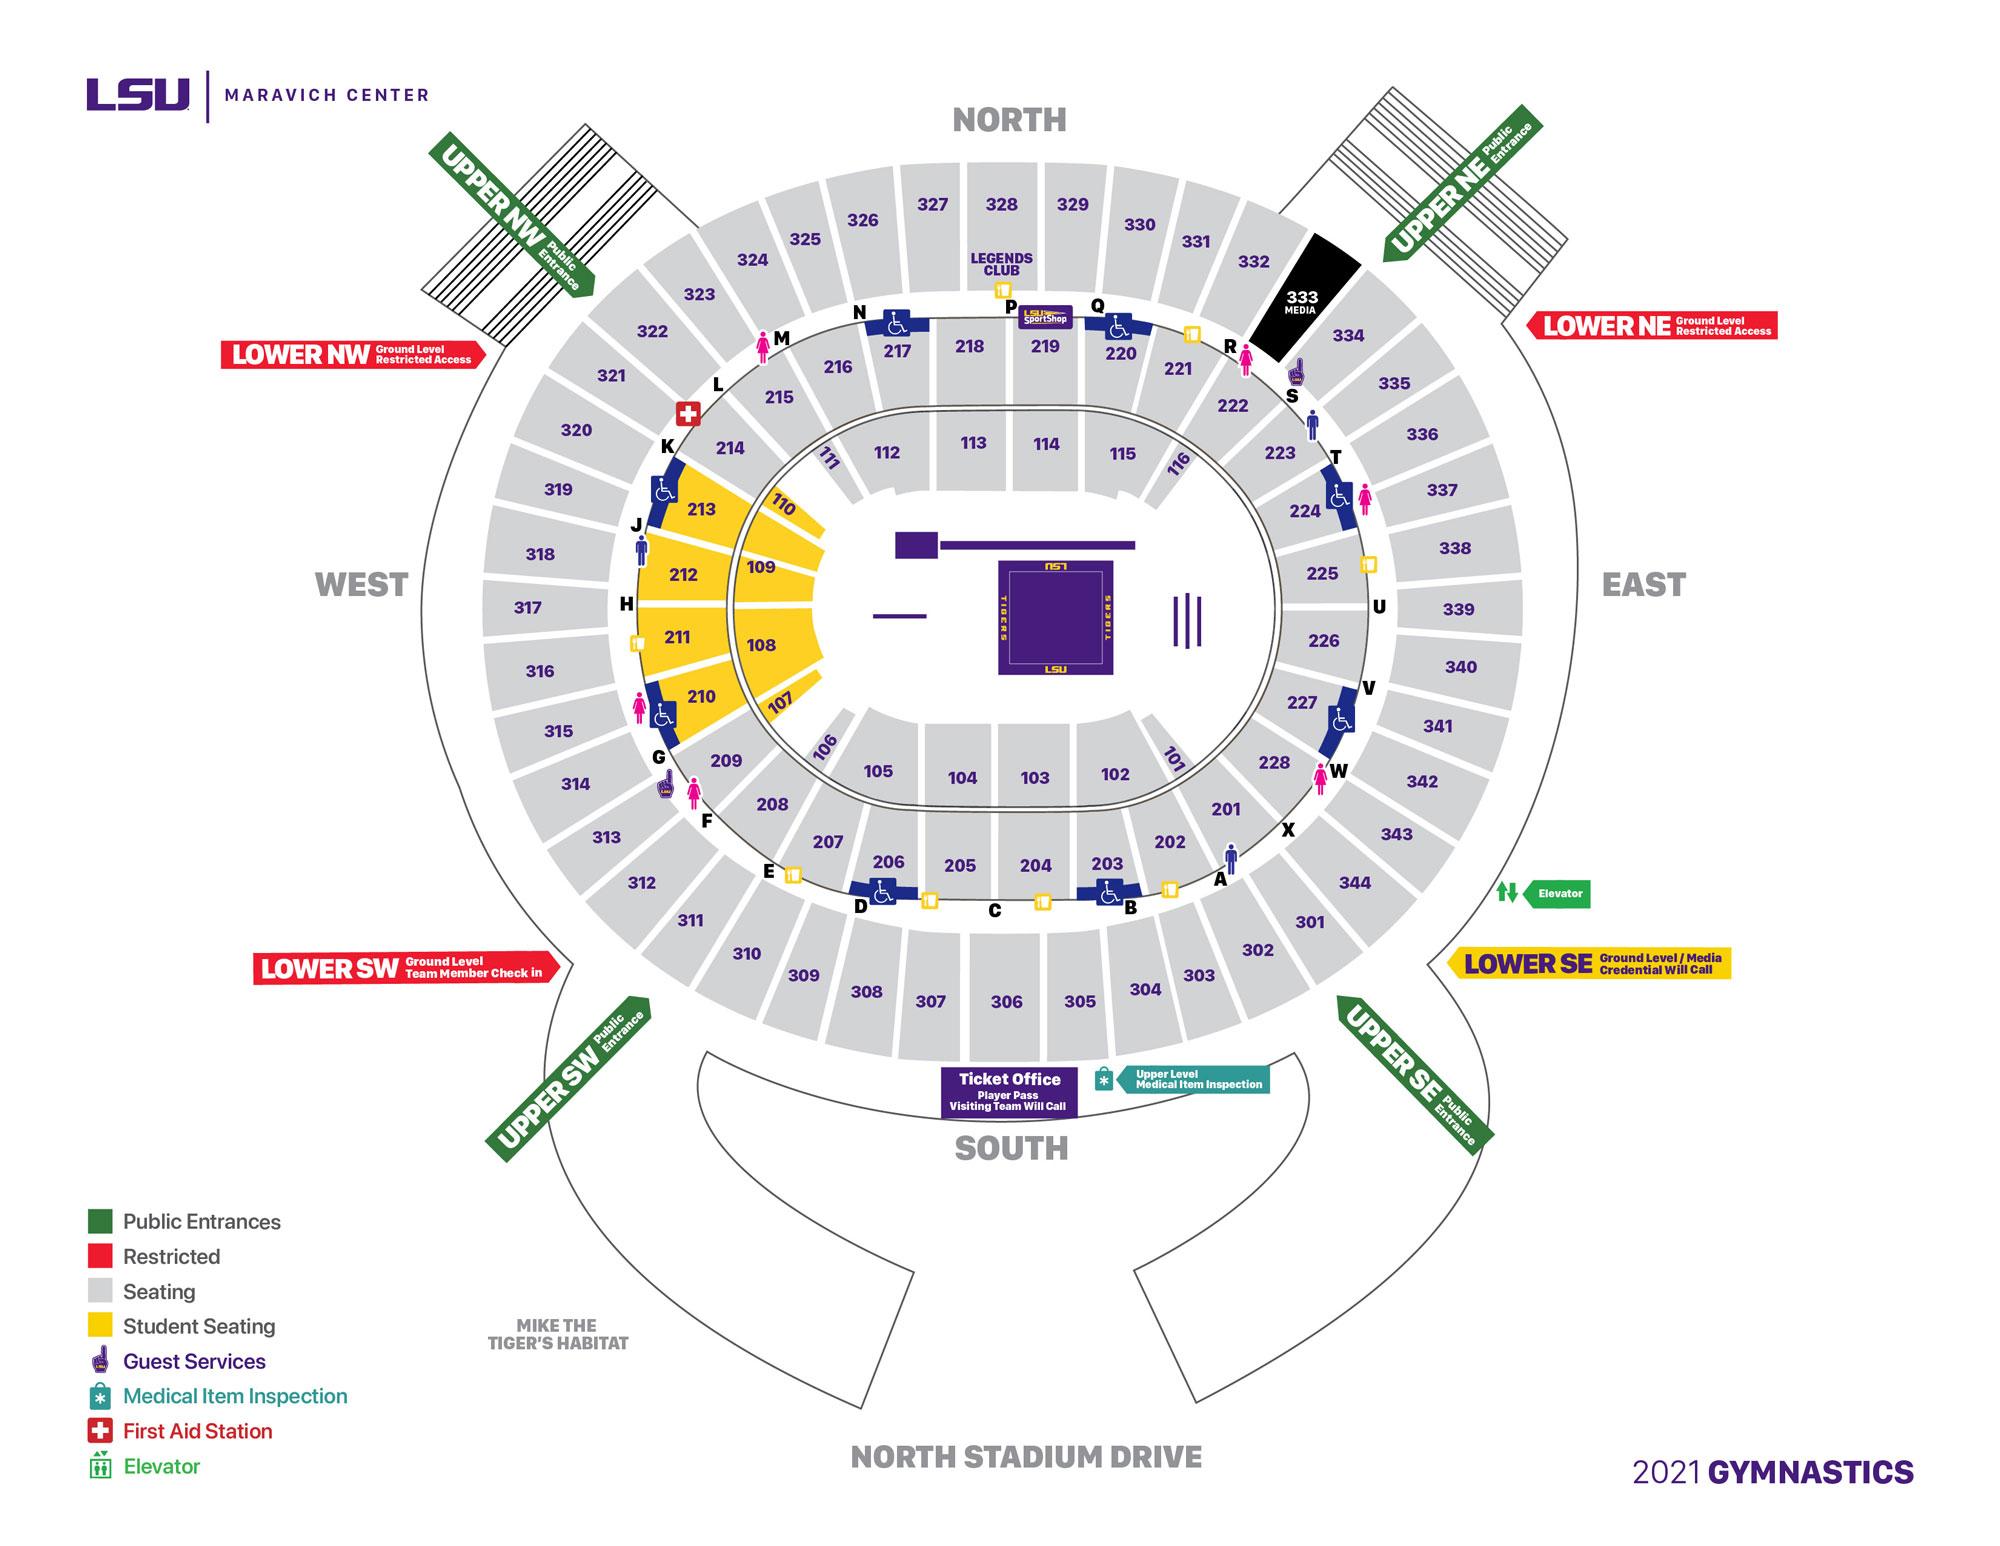 2021 LSU Gymnastics - Maravich Center Seating Chart